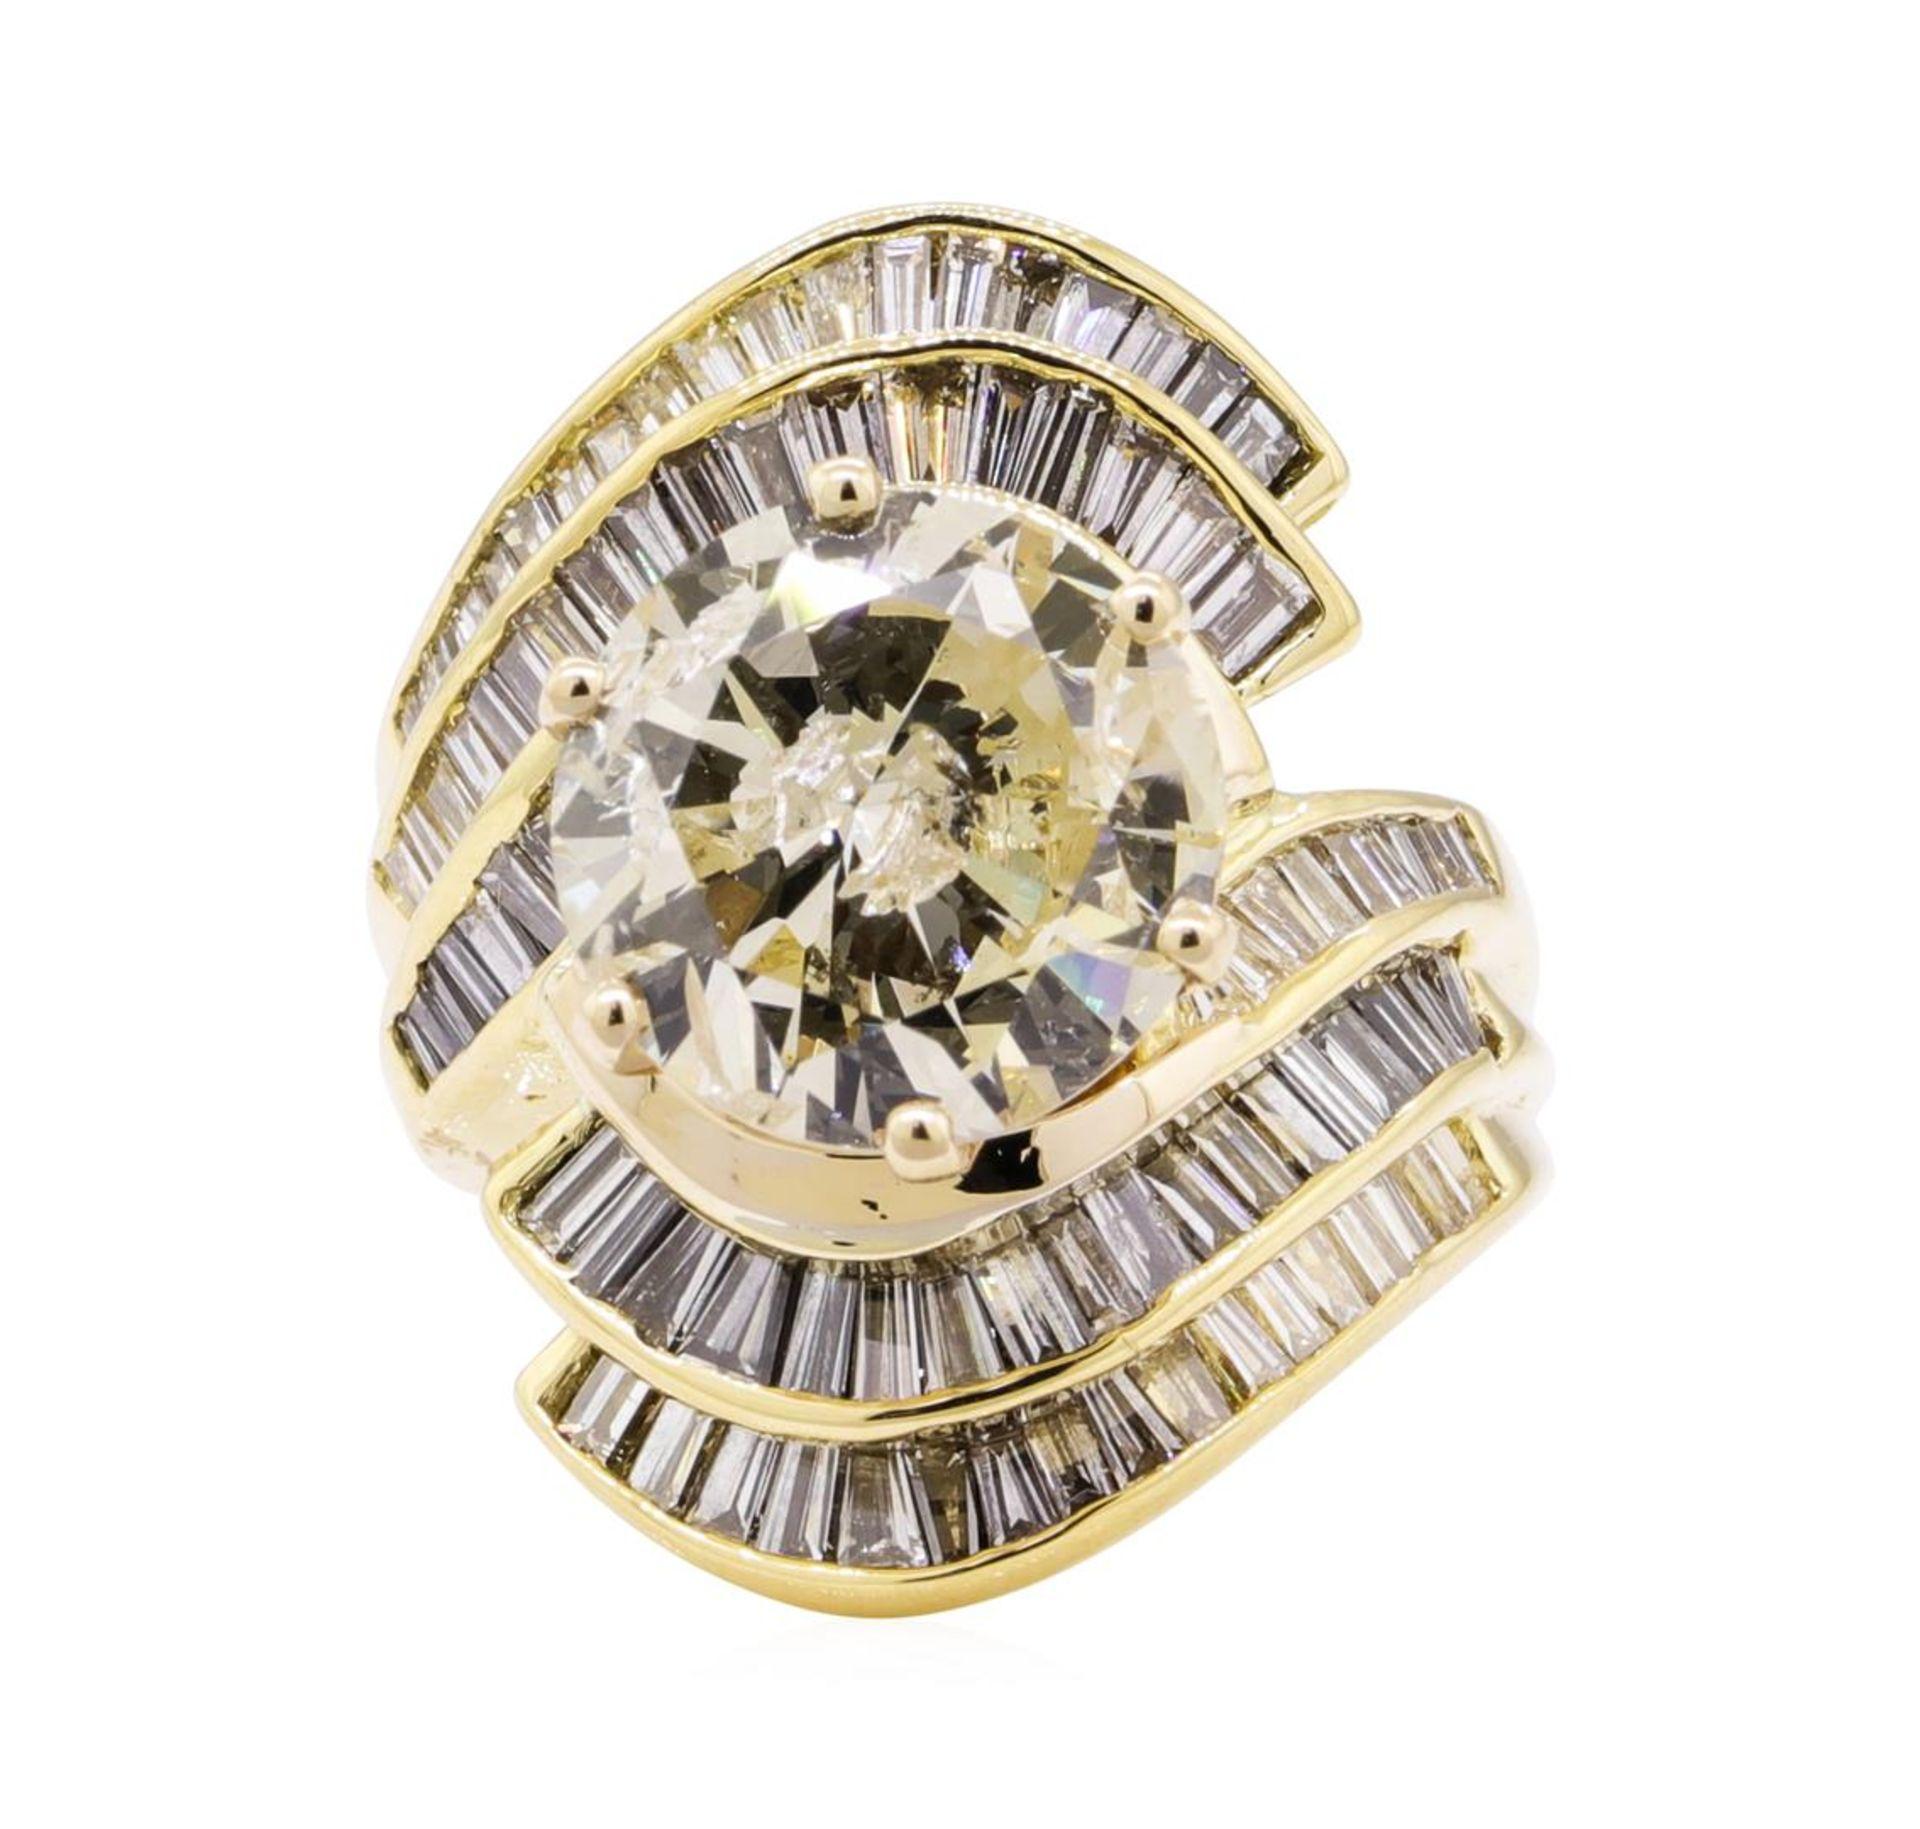 7.51 ctw Diamond Ring - 18KT Yellow Gold - Image 2 of 5